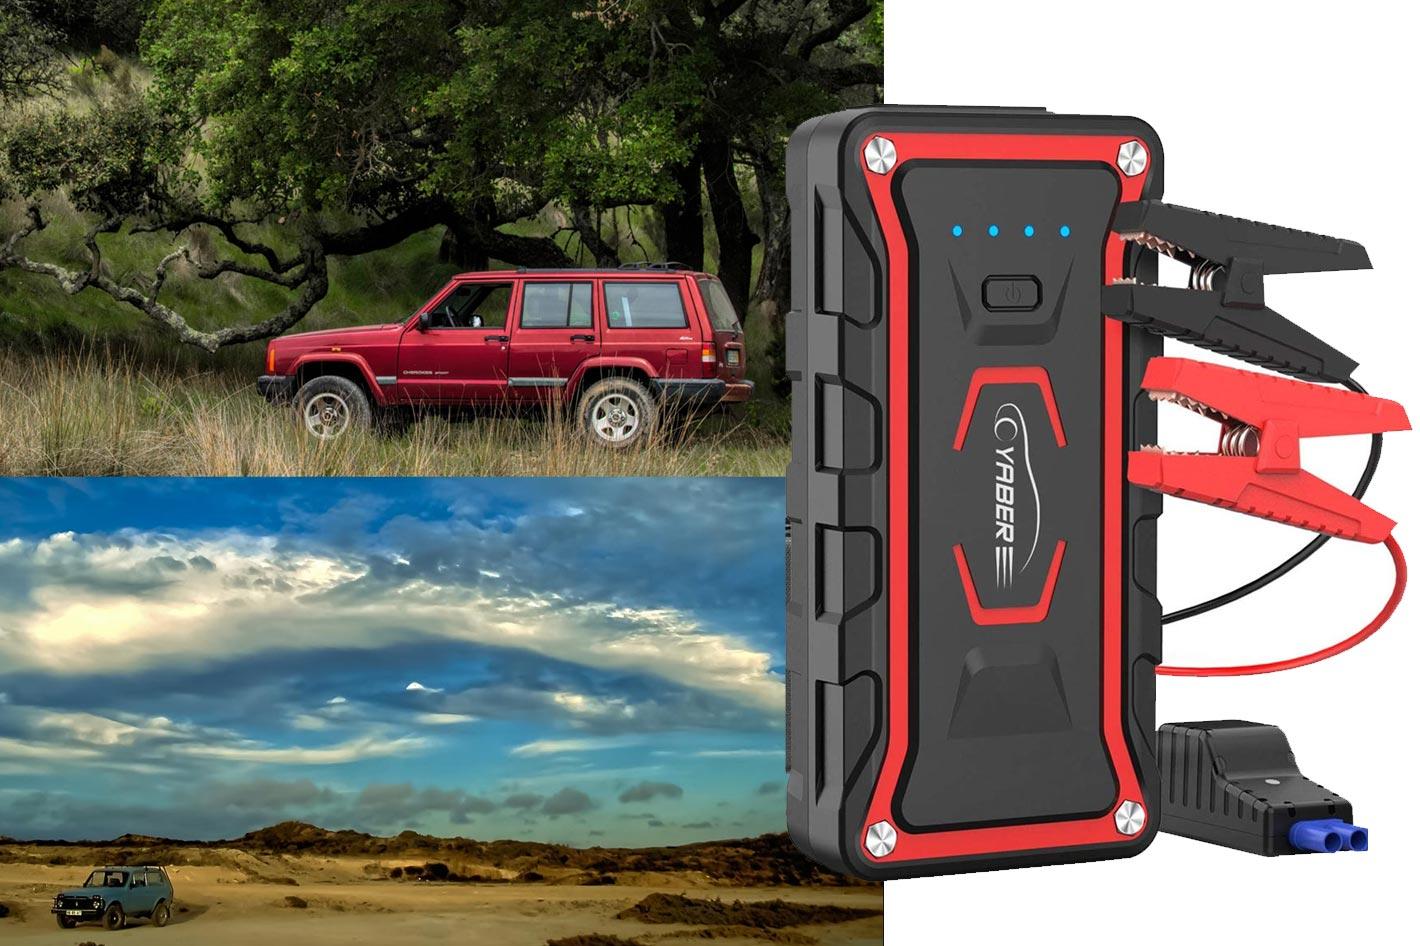 A key accessory for photographers: a car jump starter